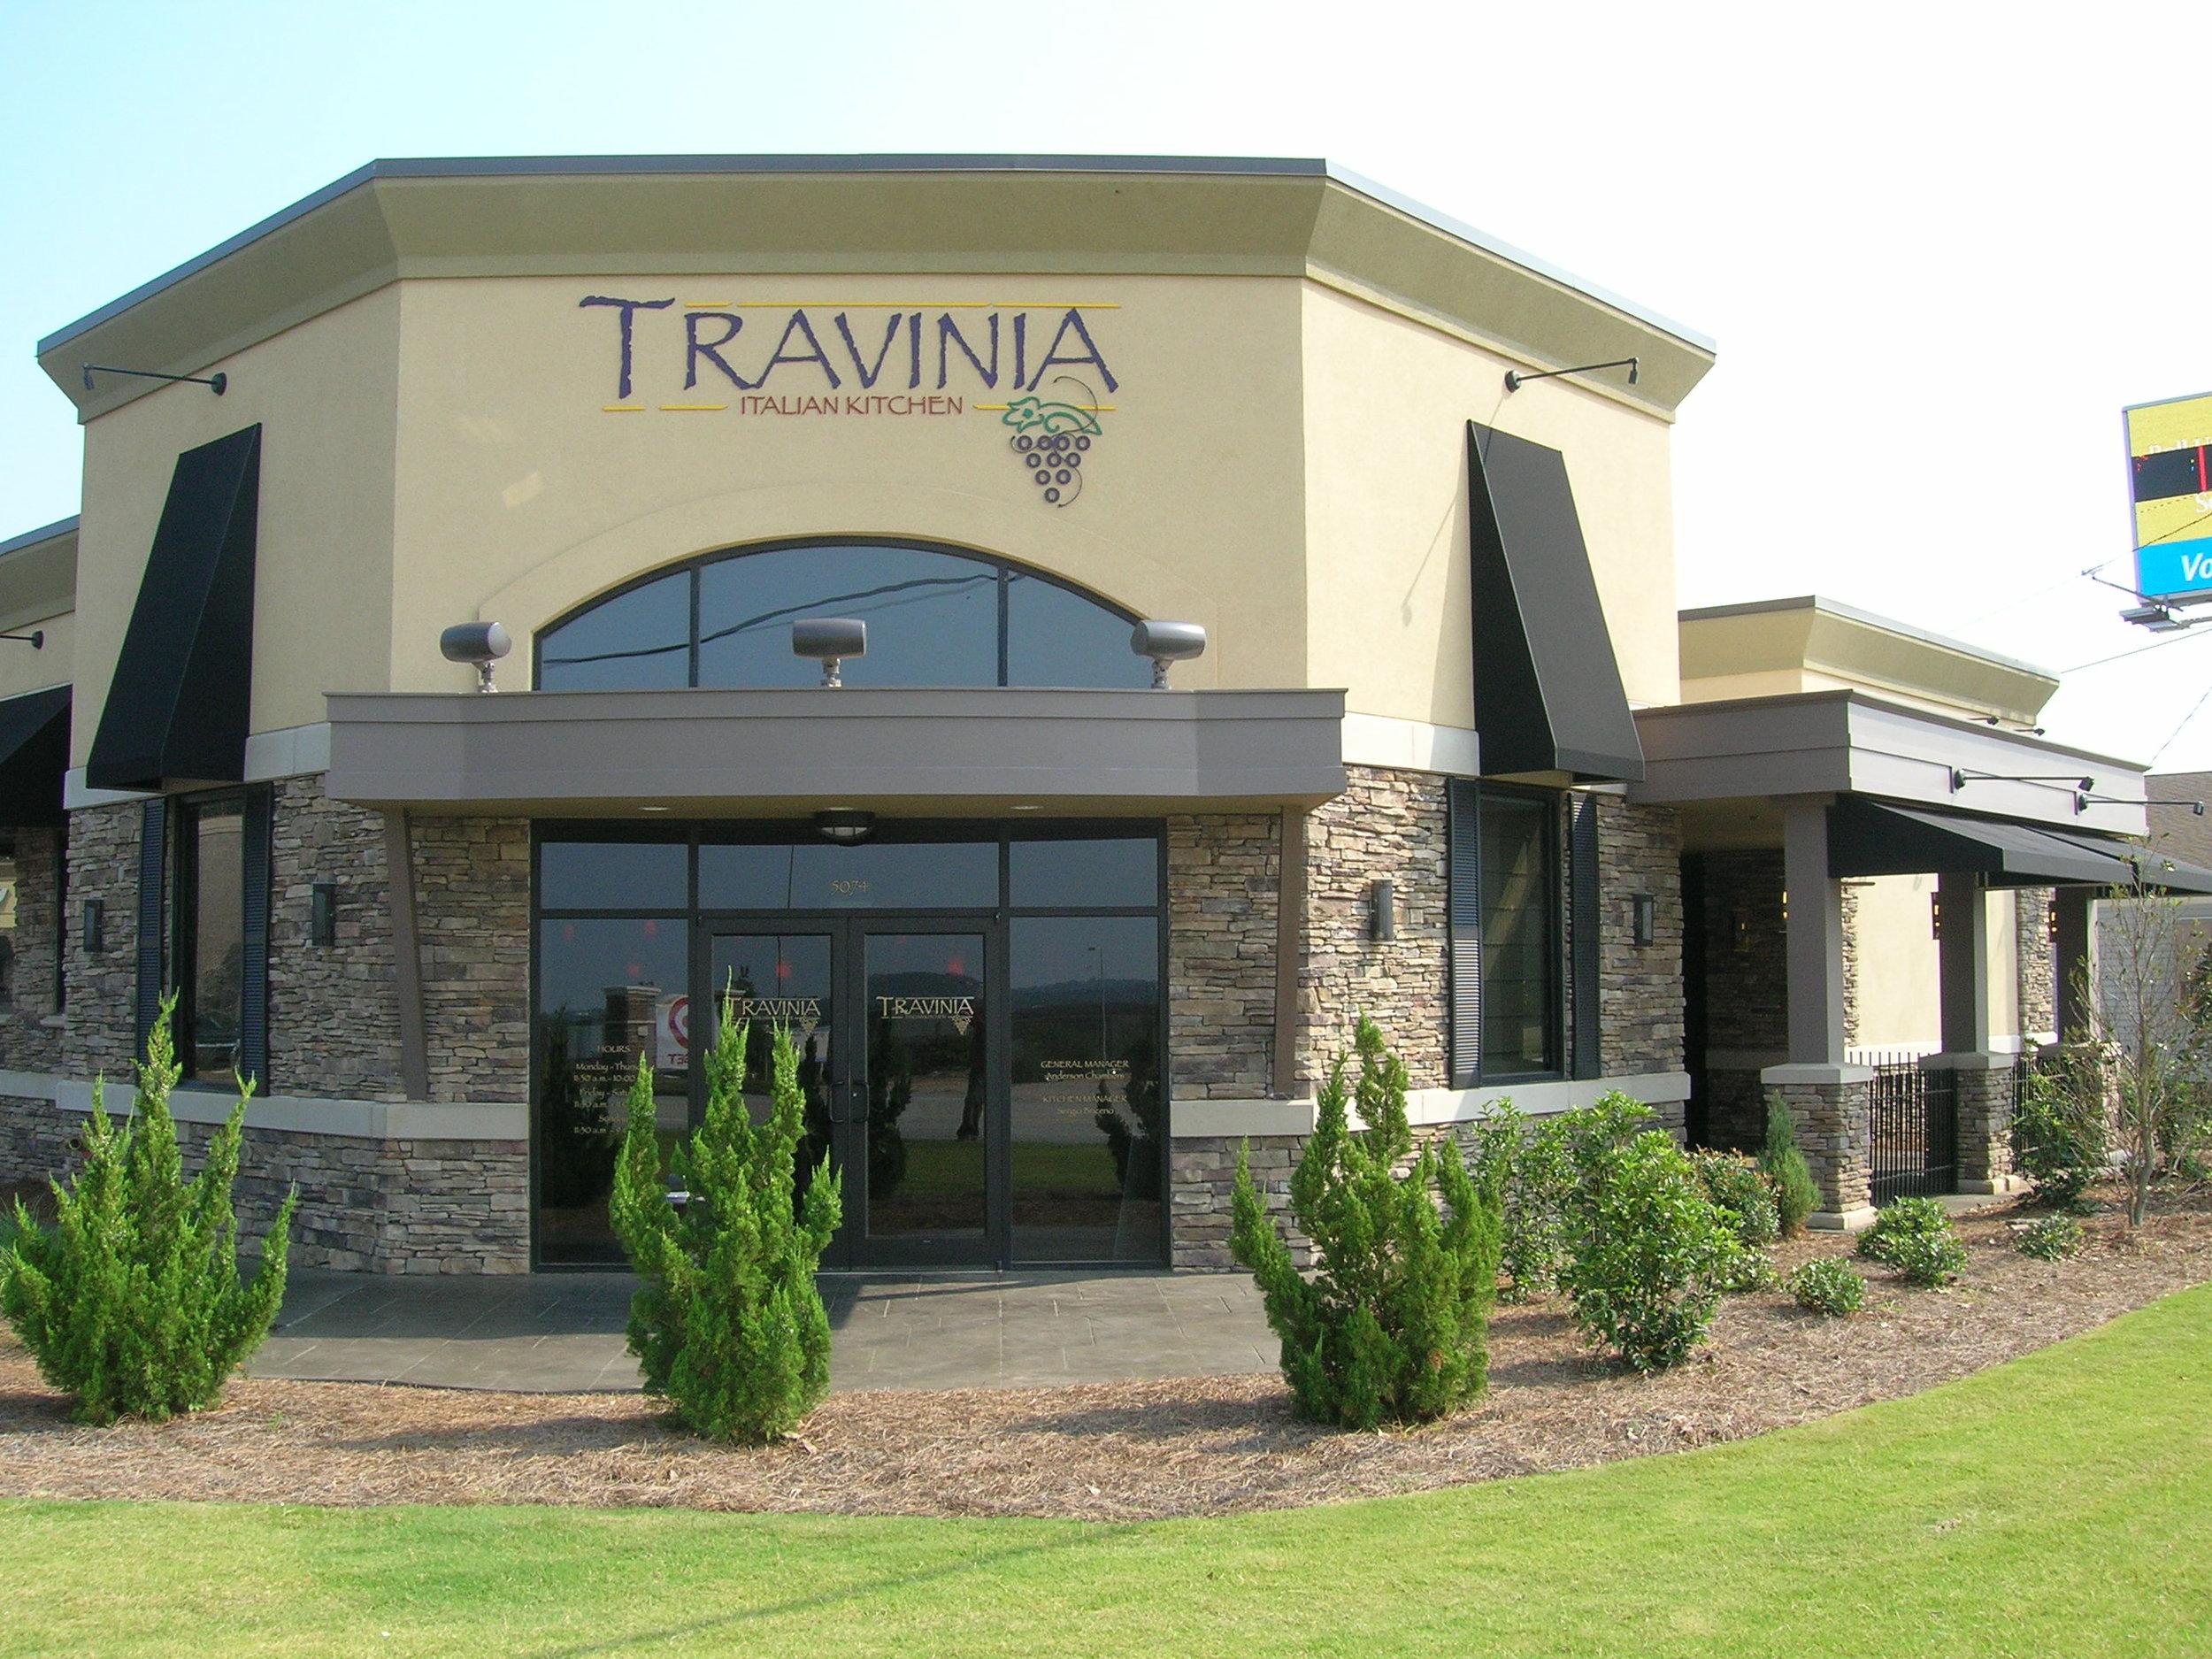 ADW-Restaurant-Travinia-Italian-Kitchen-Exterior-Lexington-SC.JPG